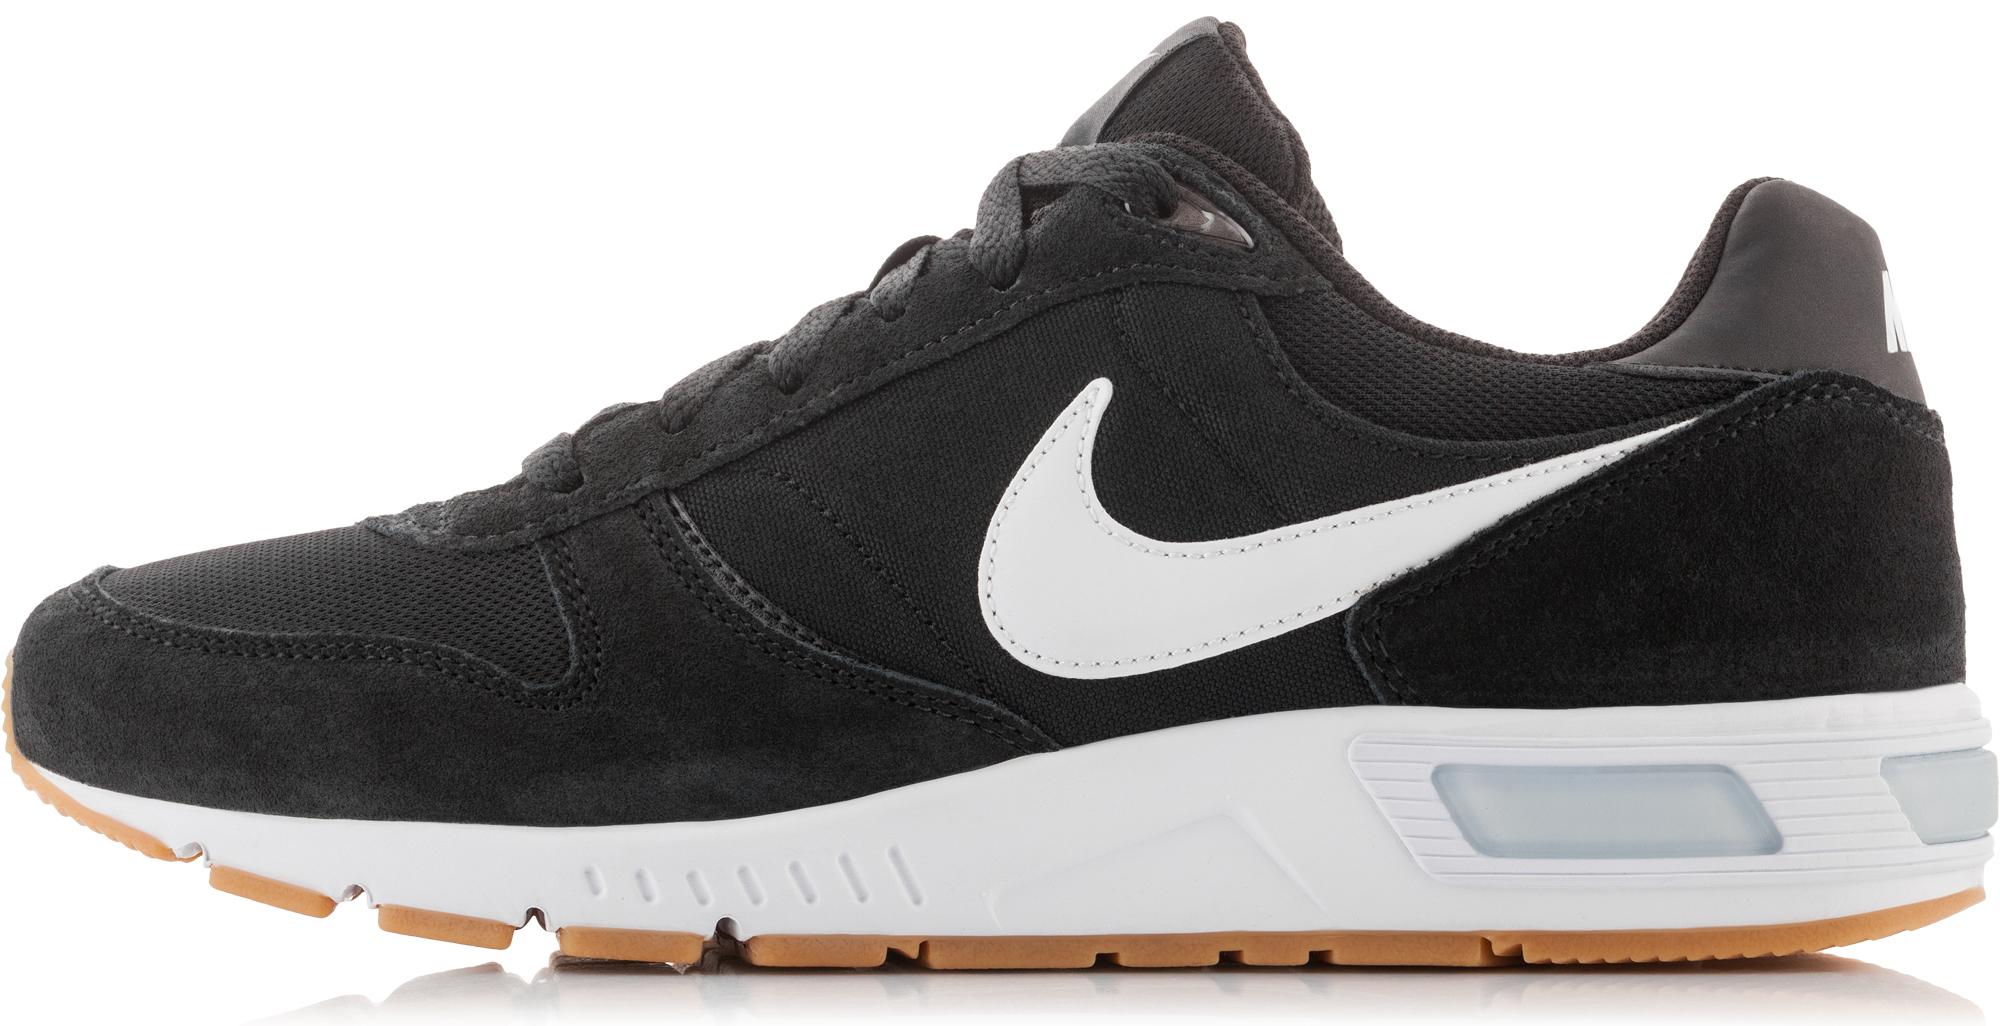 Nike Кроссовки мужские Nike Nightgazer, размер 44